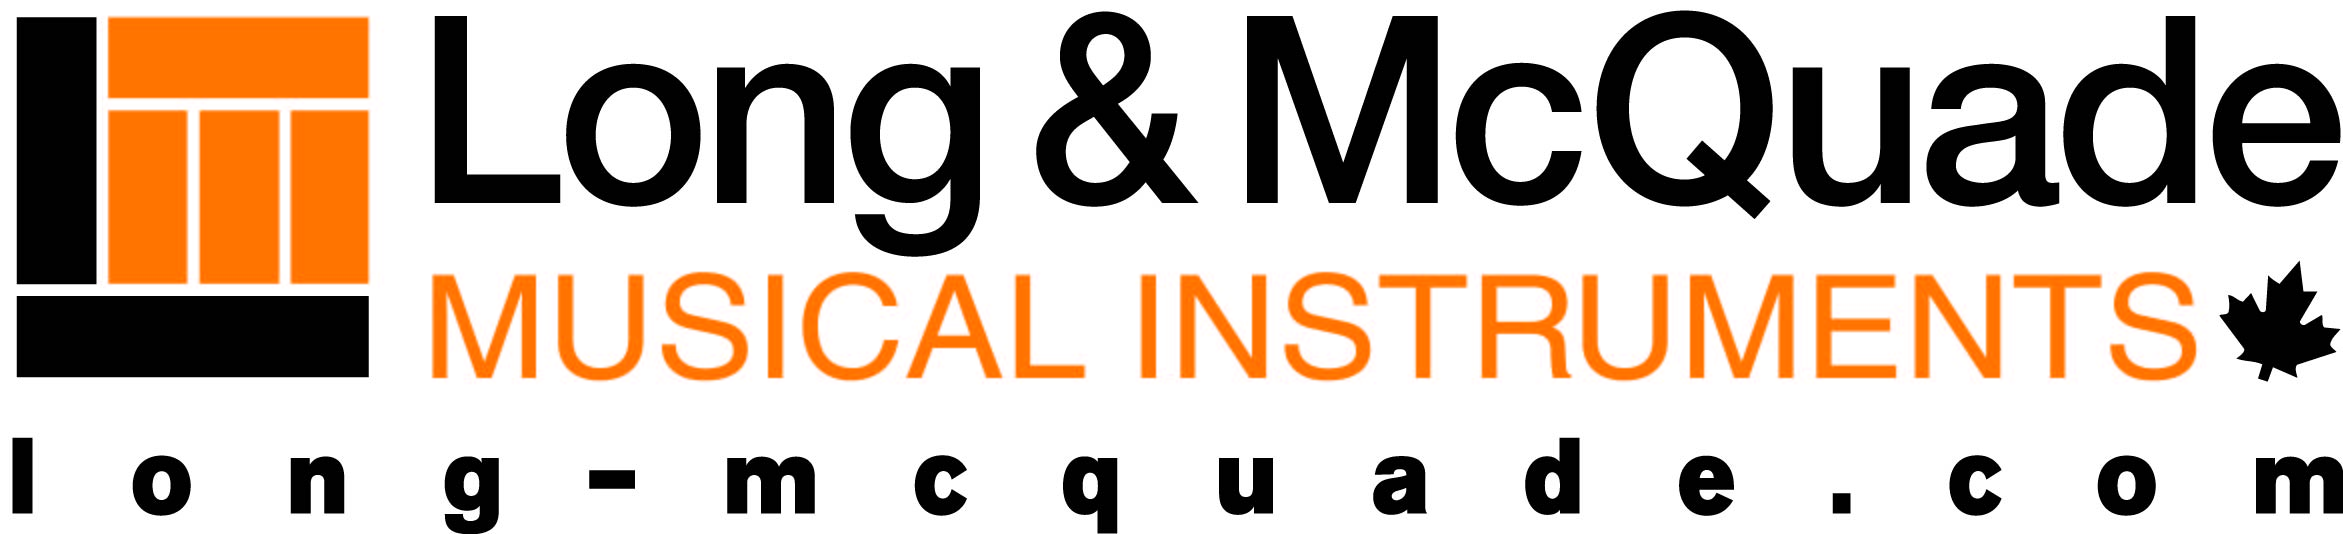 Copy of LM logo.jpg